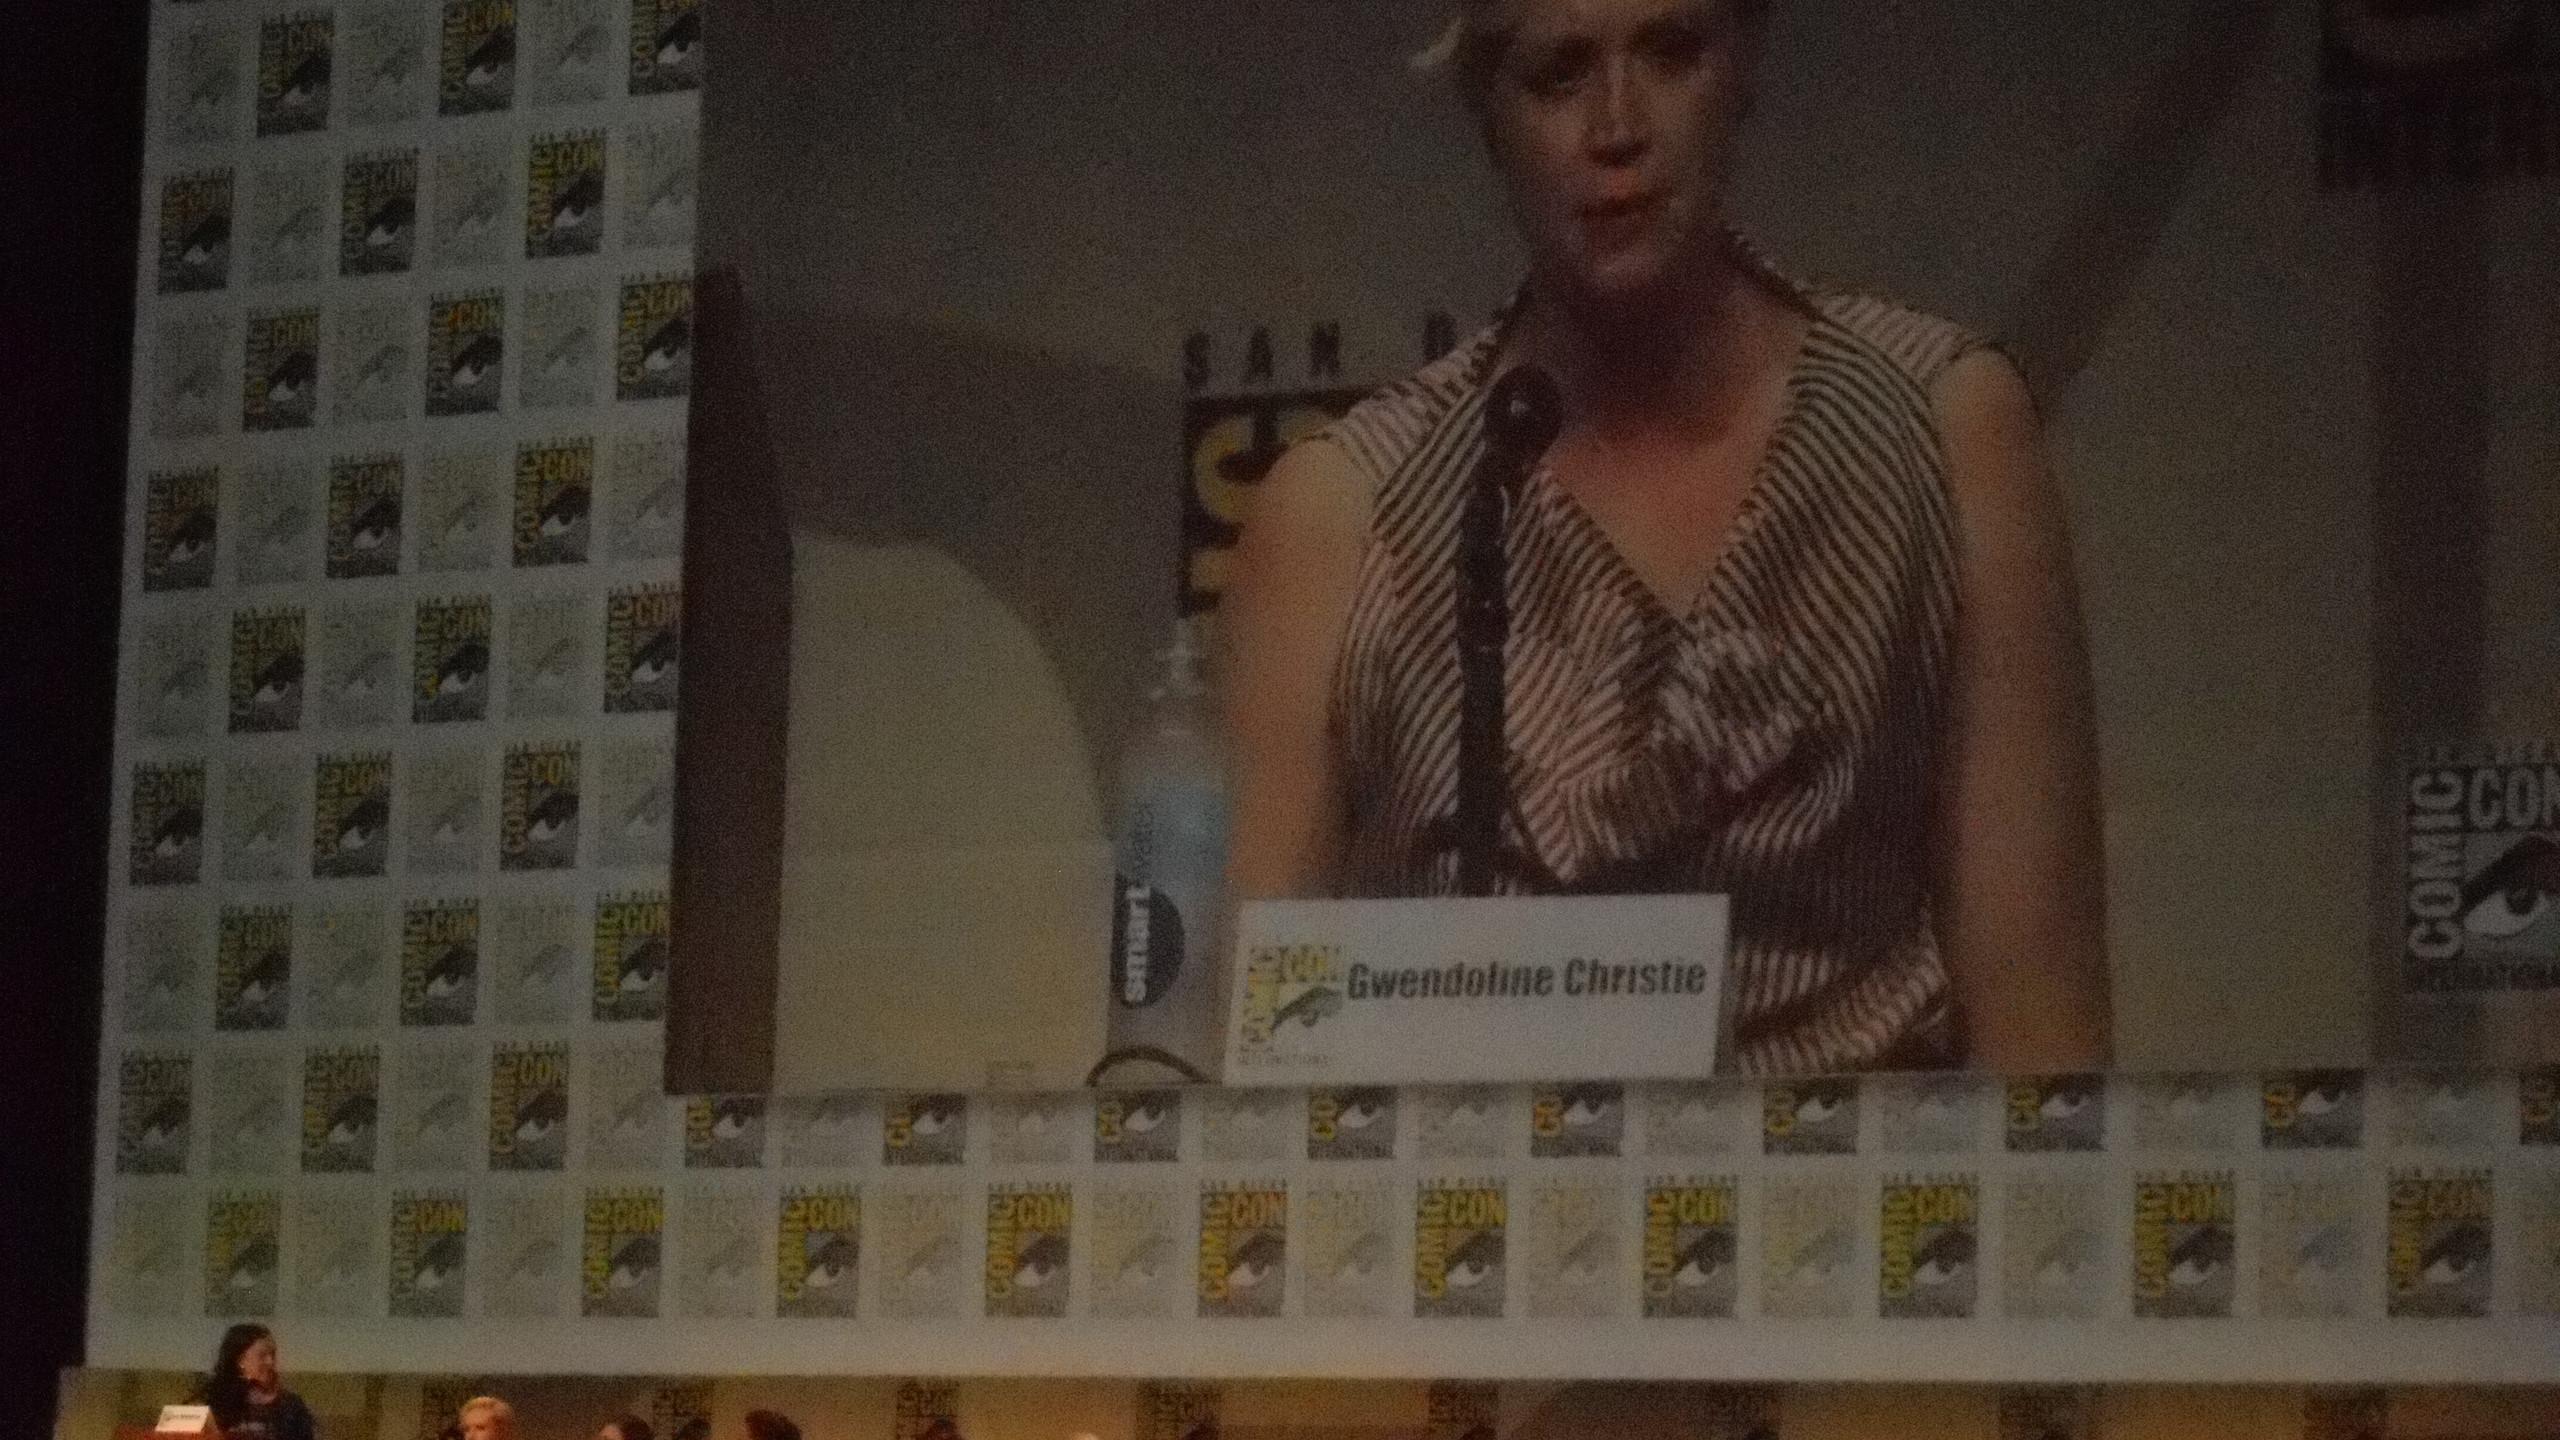 San Diego, Comic-Con, convention, SDCC, Gwendoline Christie